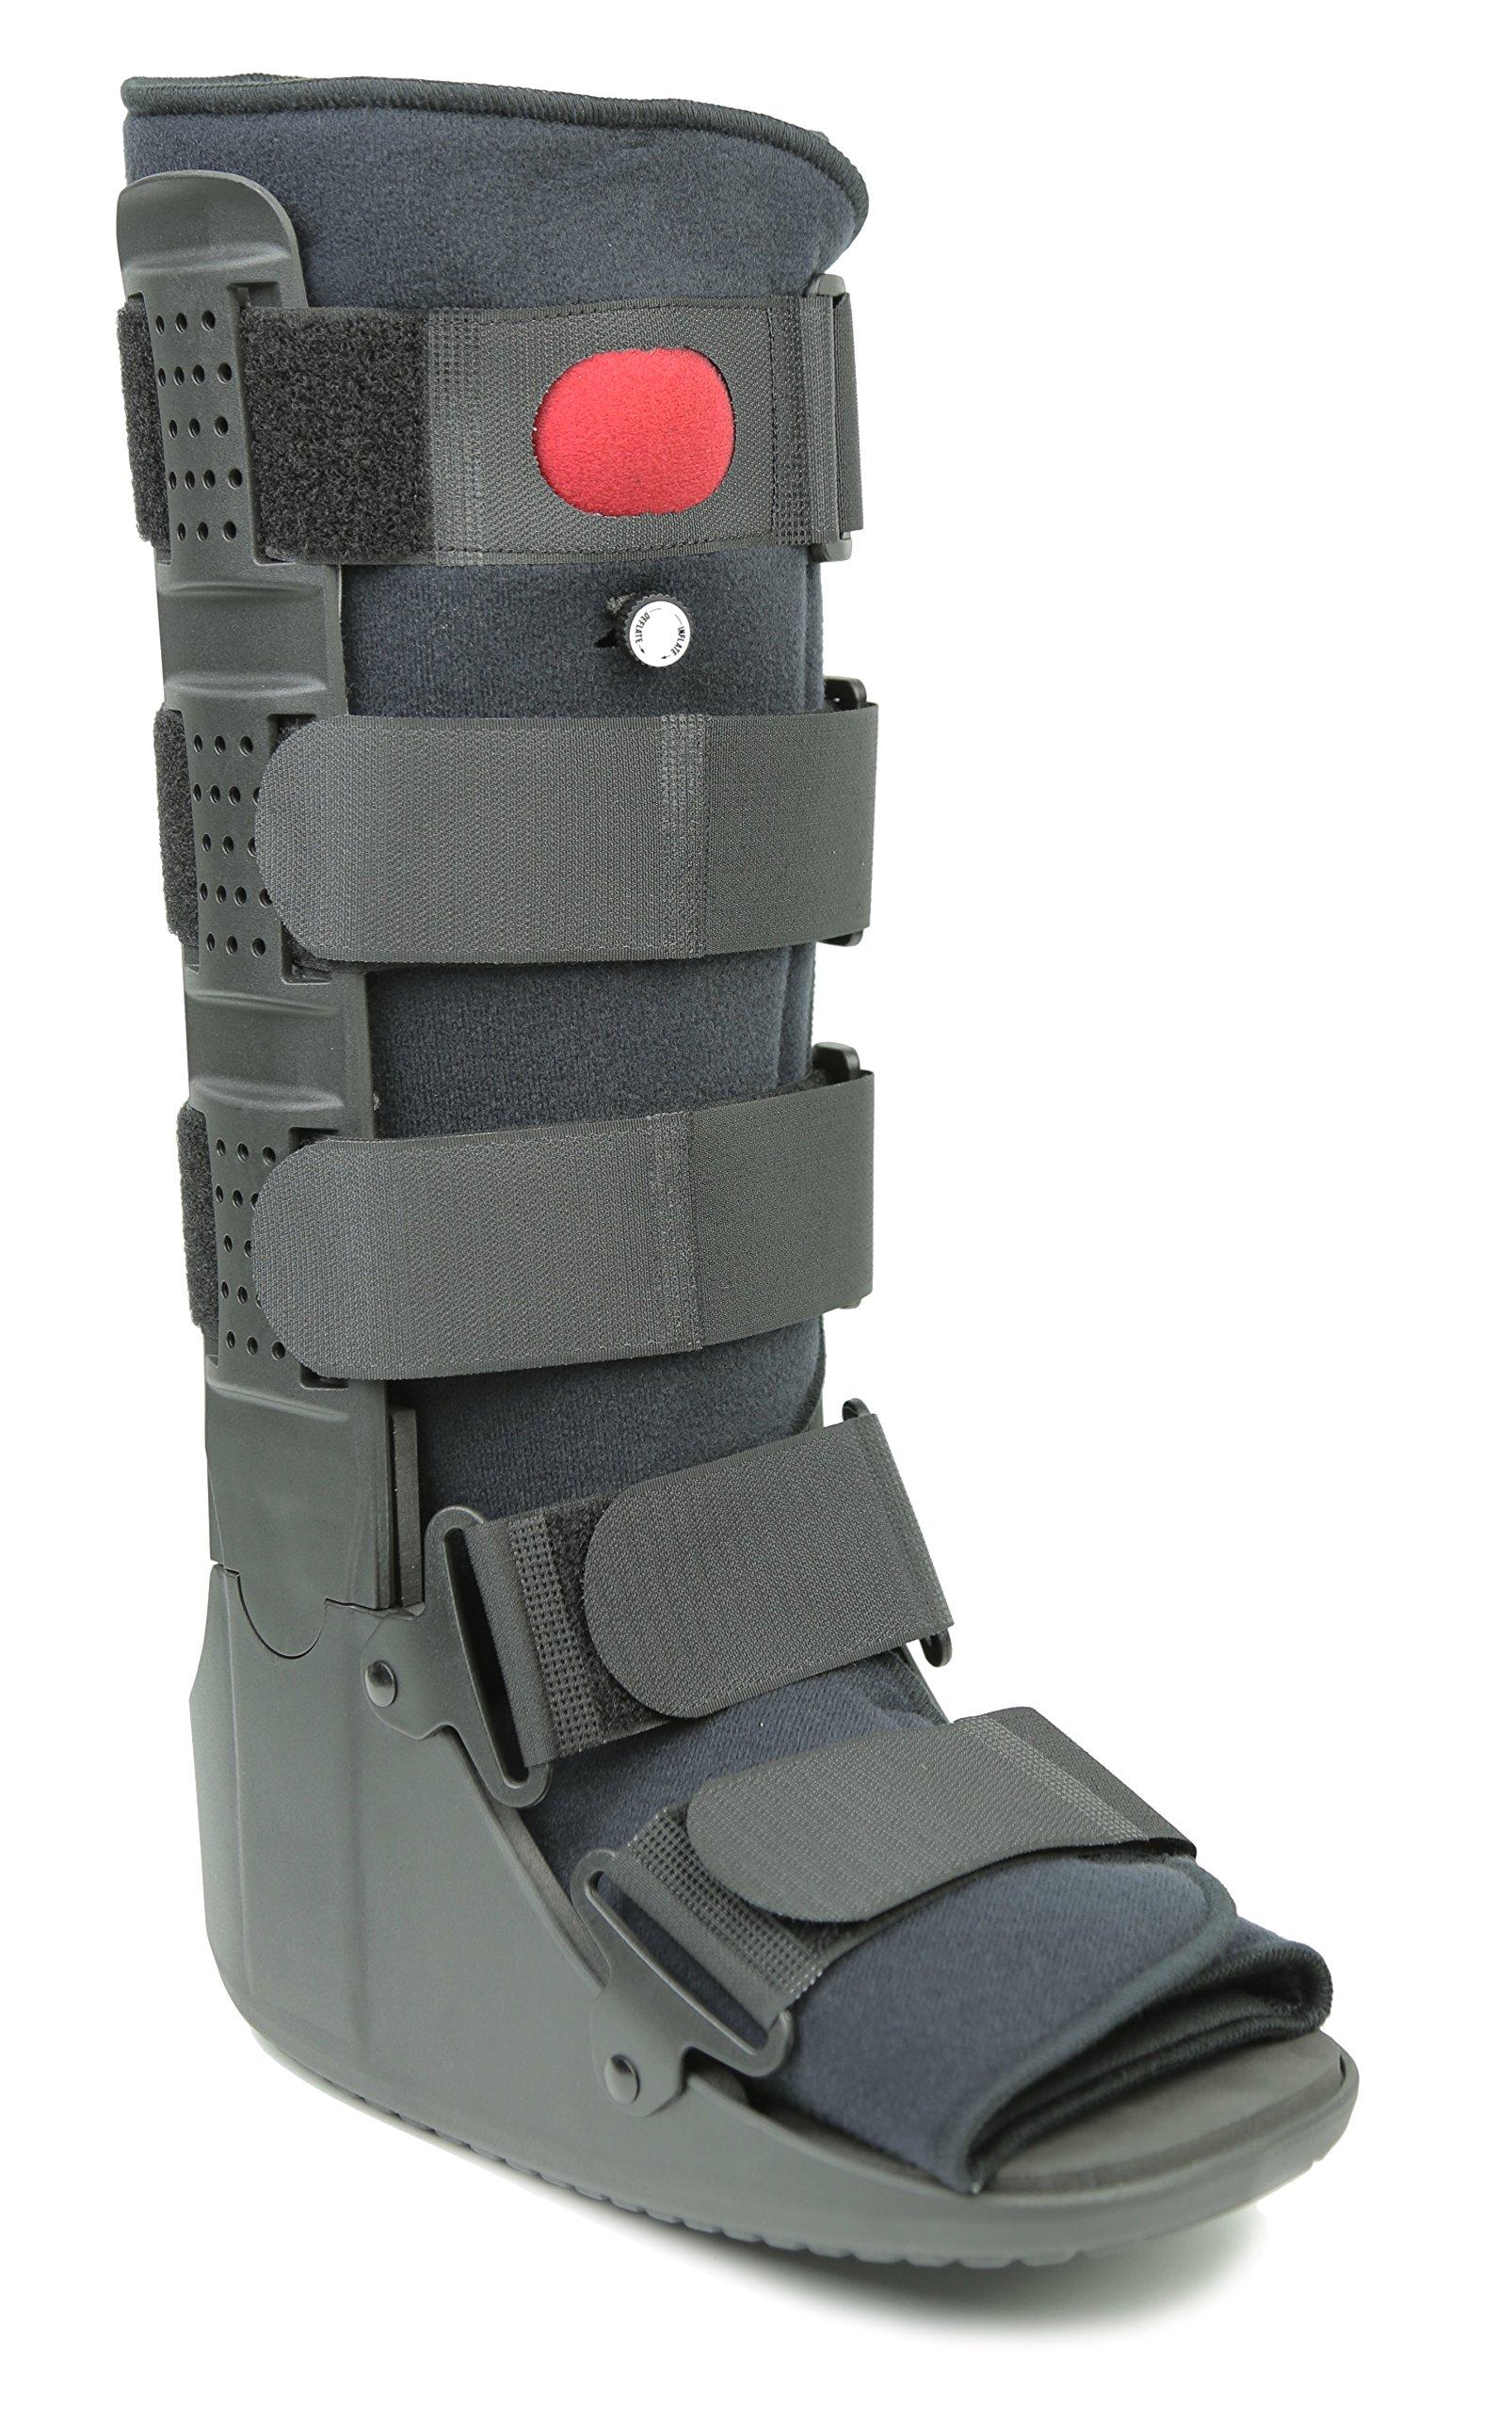 Mars Wellness Premium Tall Air Cam Walker Fracture Ankle/Foot Stabilizer Boot - Medium by MARS WELLNESS